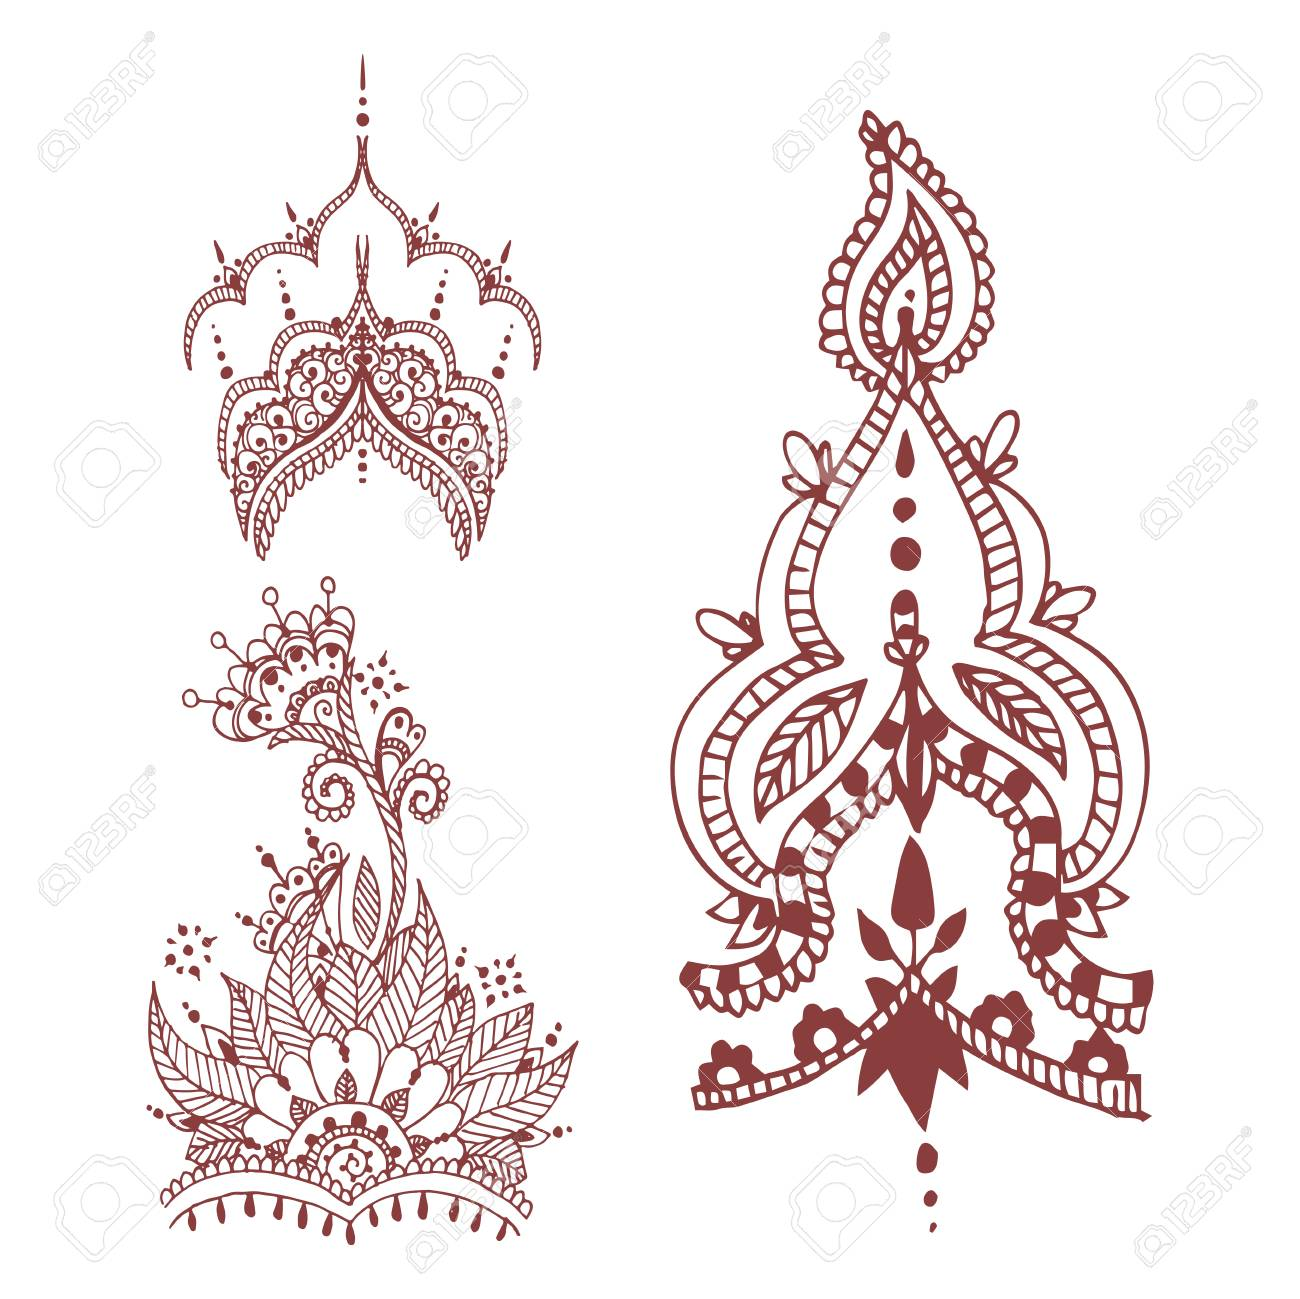 857158b86 Henna tattoo brown mehndi flower doodle ornamental decorative indian design  pattern paisley Stock Vector - 83748094